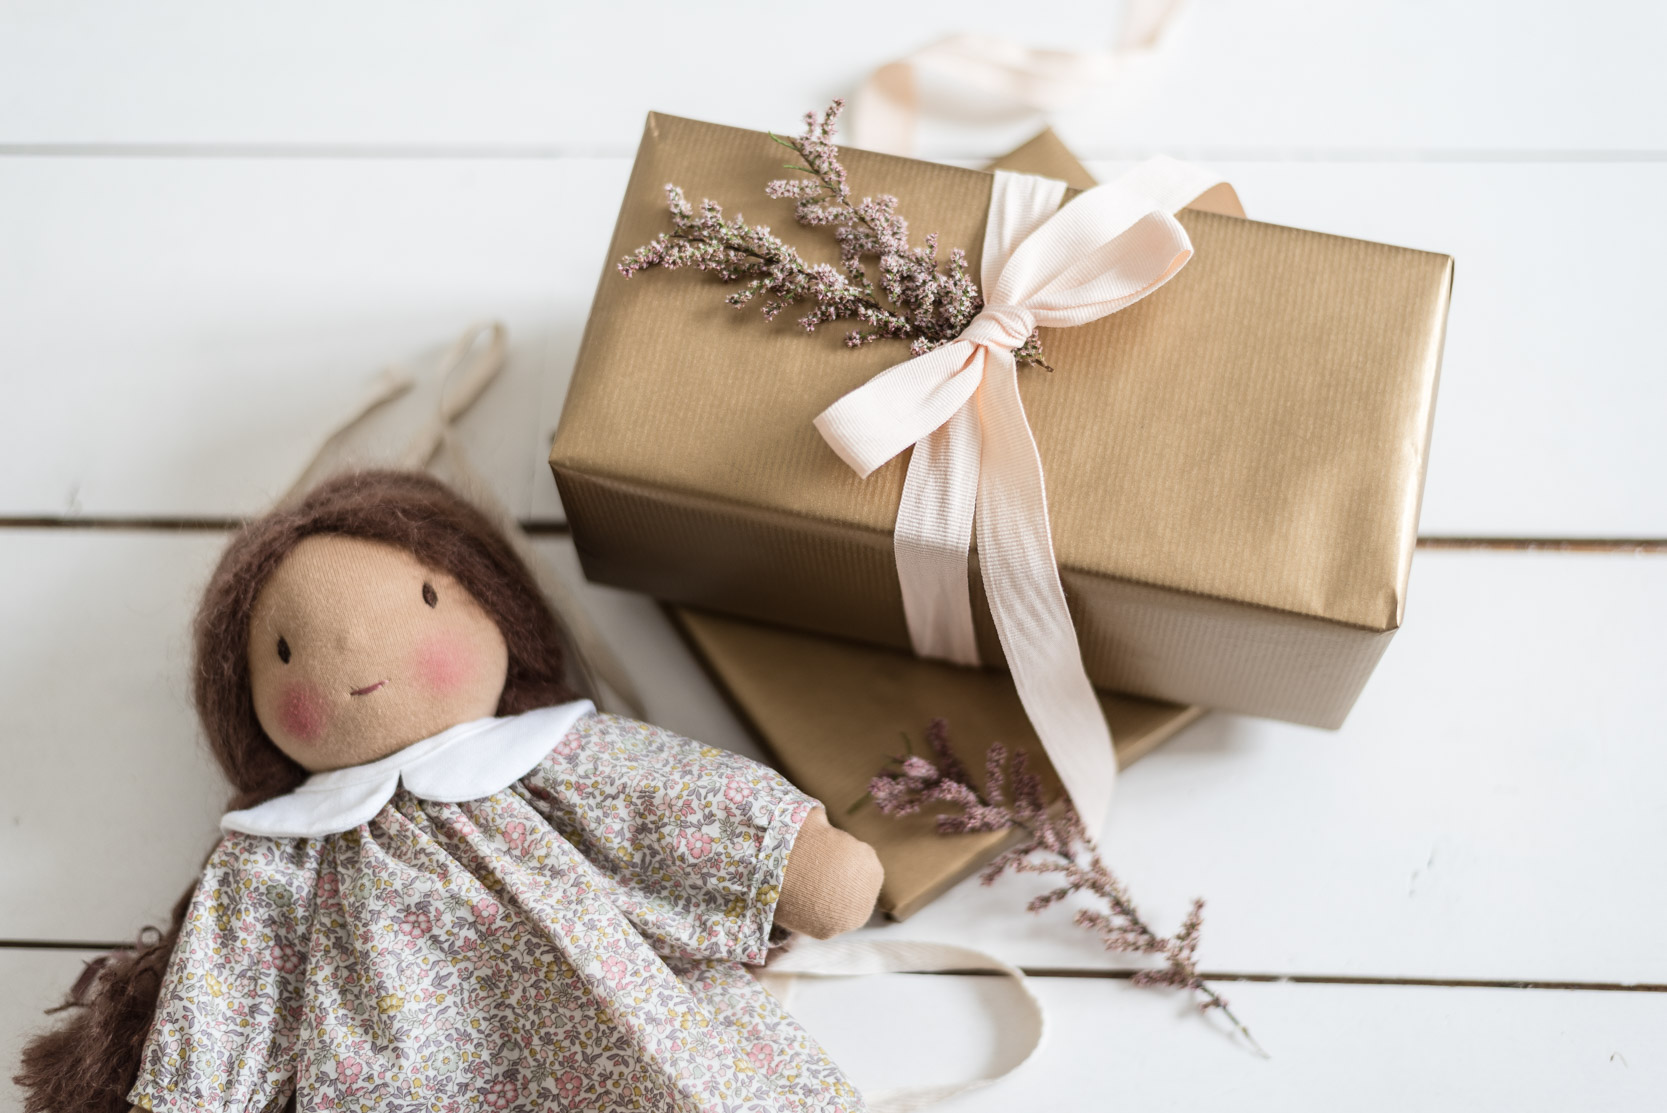 cadeaux (6 of 21).jpg